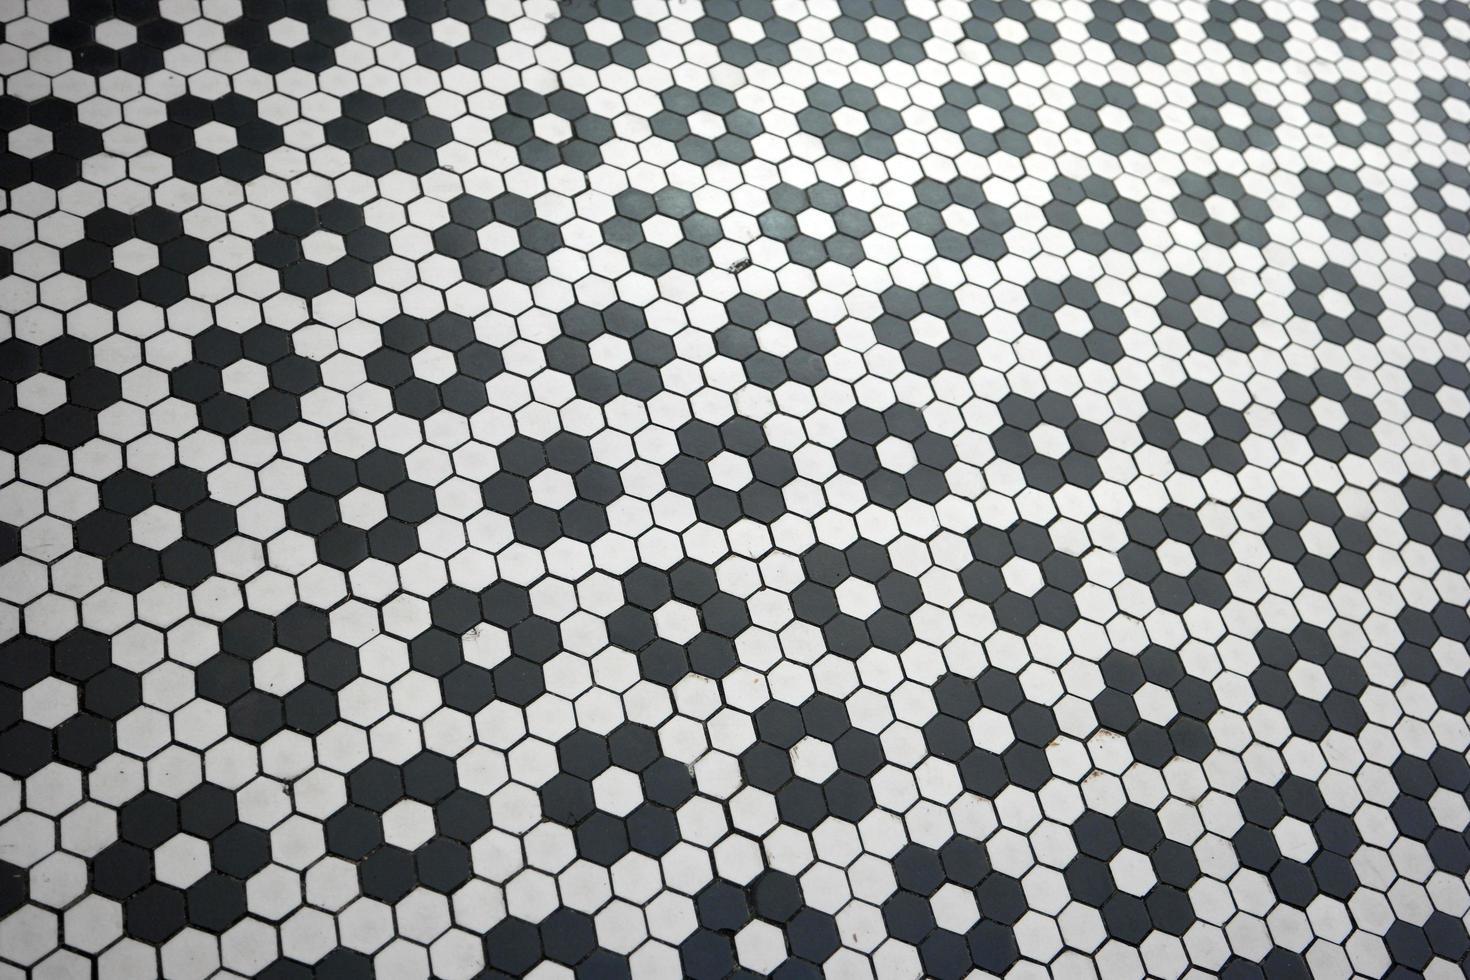 Black and white tile design photo